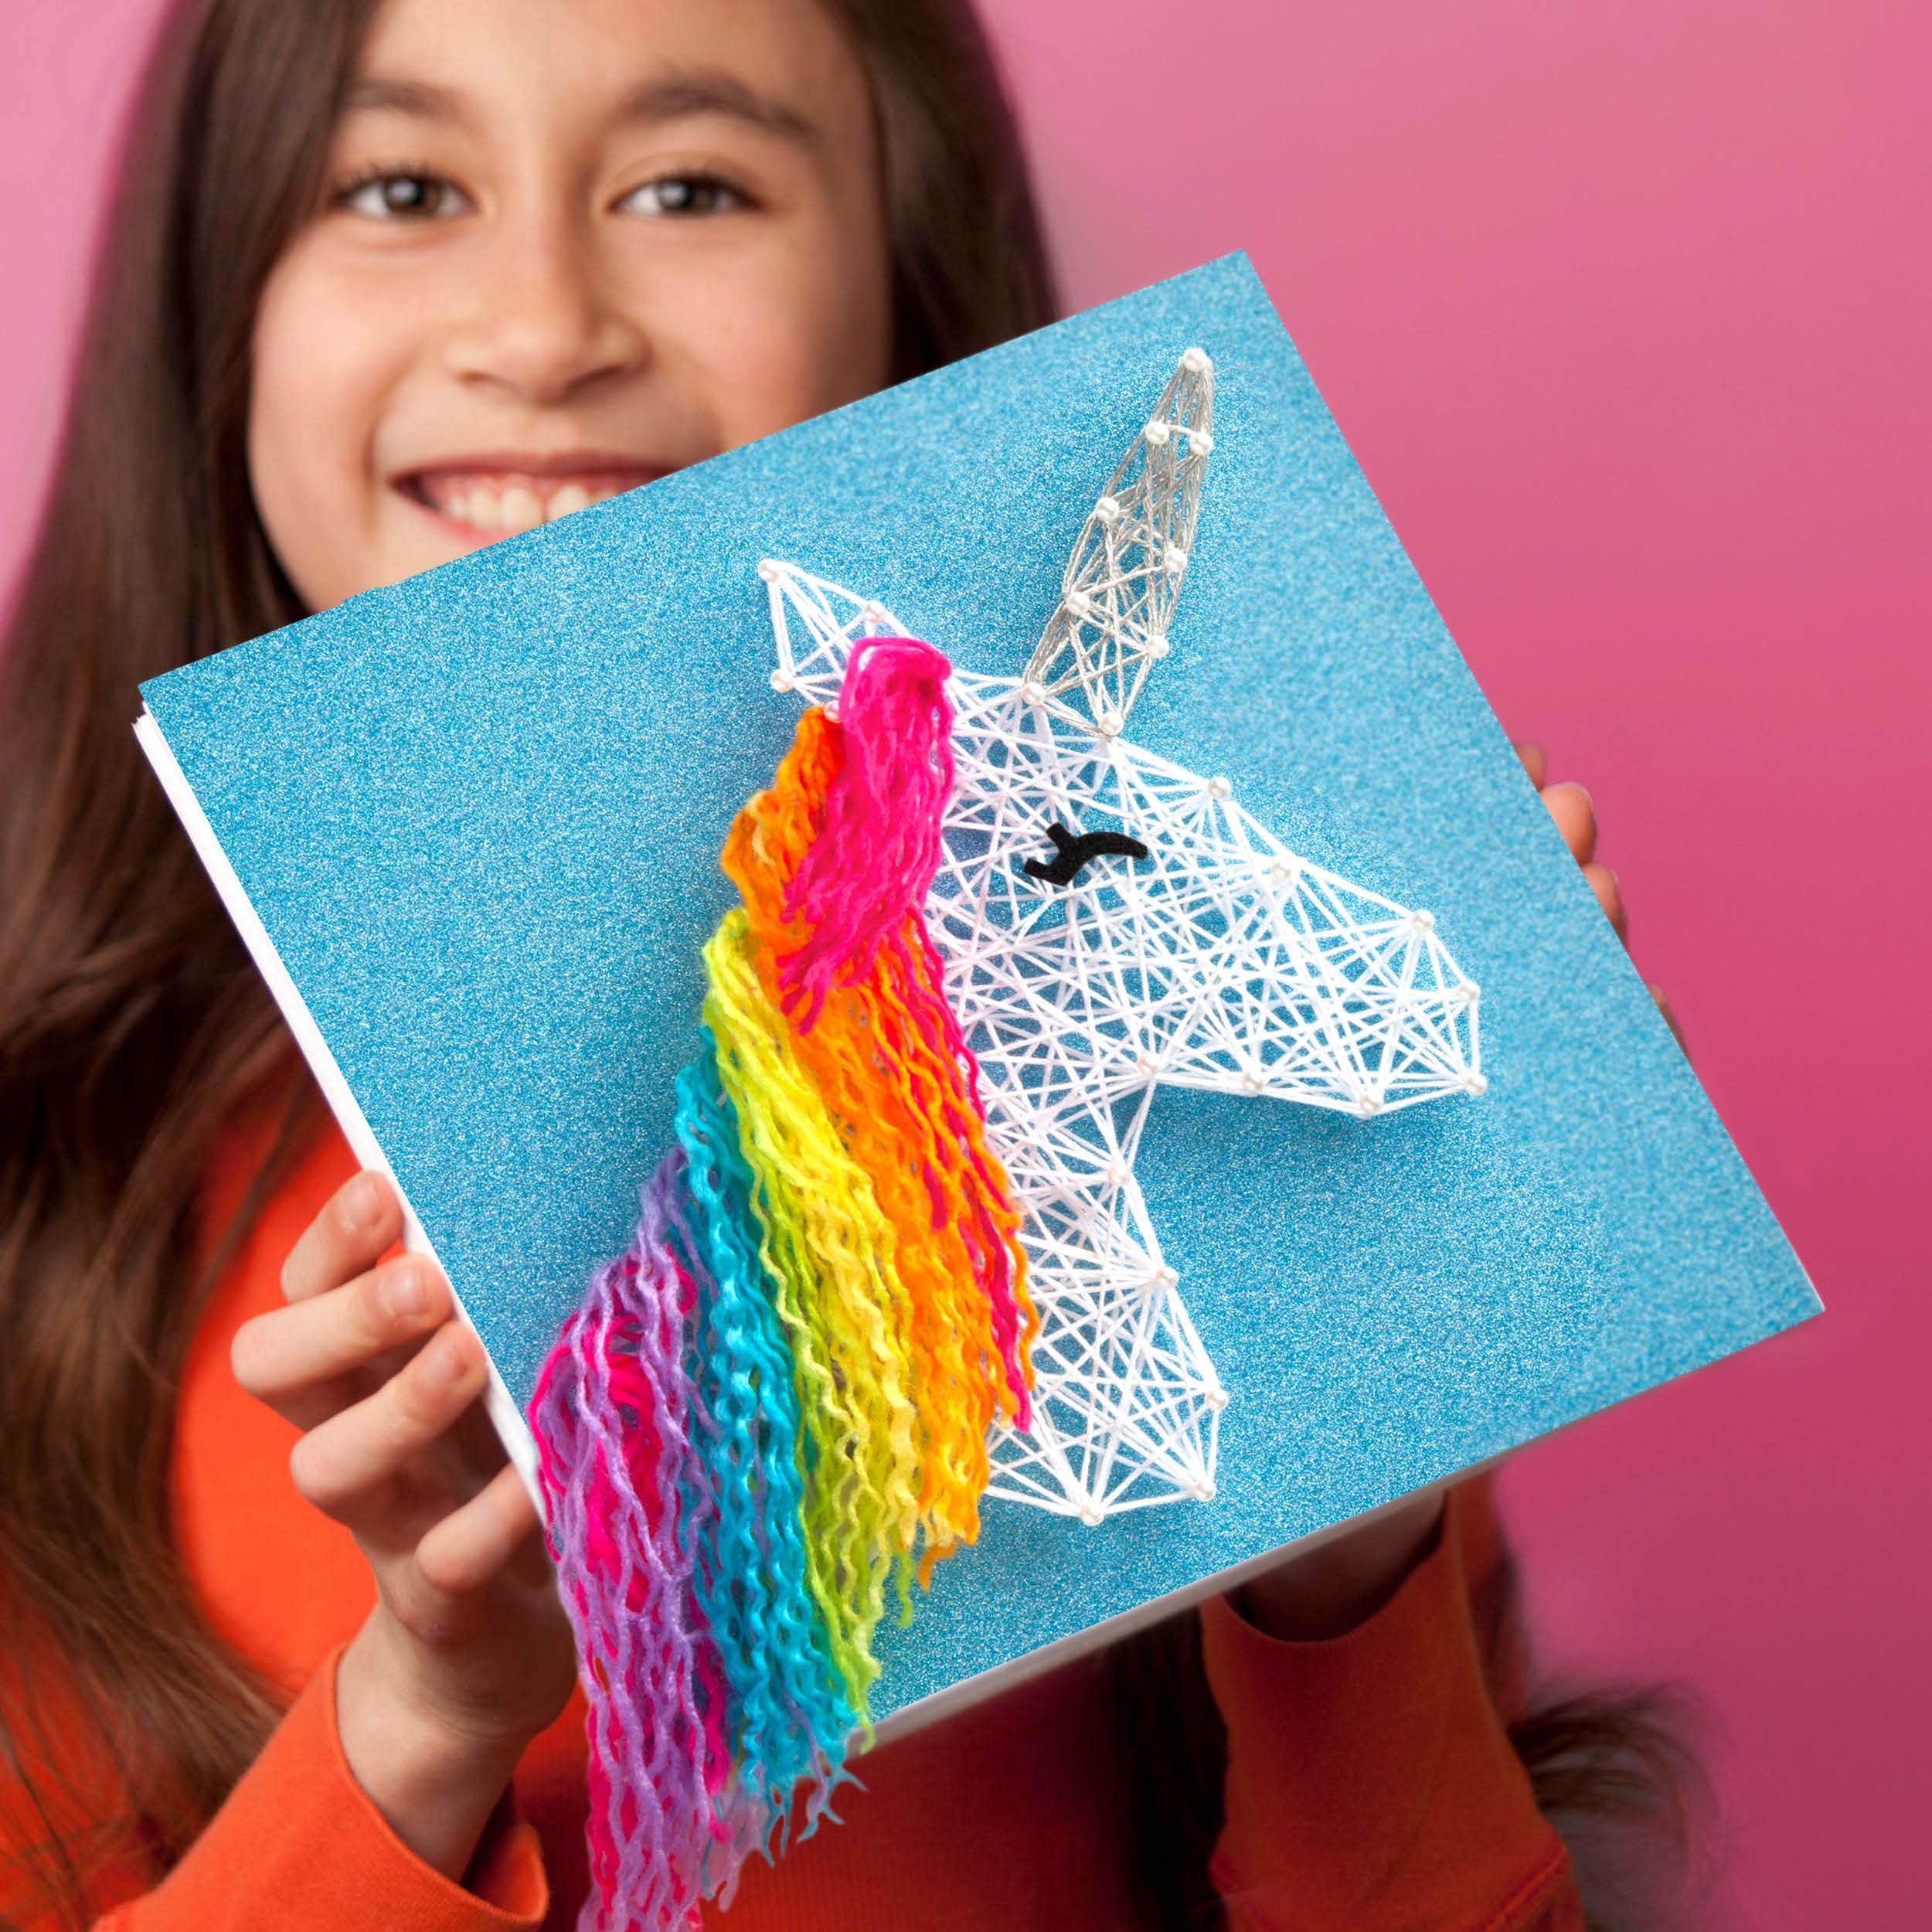 Amazon Com Craft Tastic String Art Kit Craft Kit Makes 2 Large String Art Canvases Unicorn Edition Toys Games